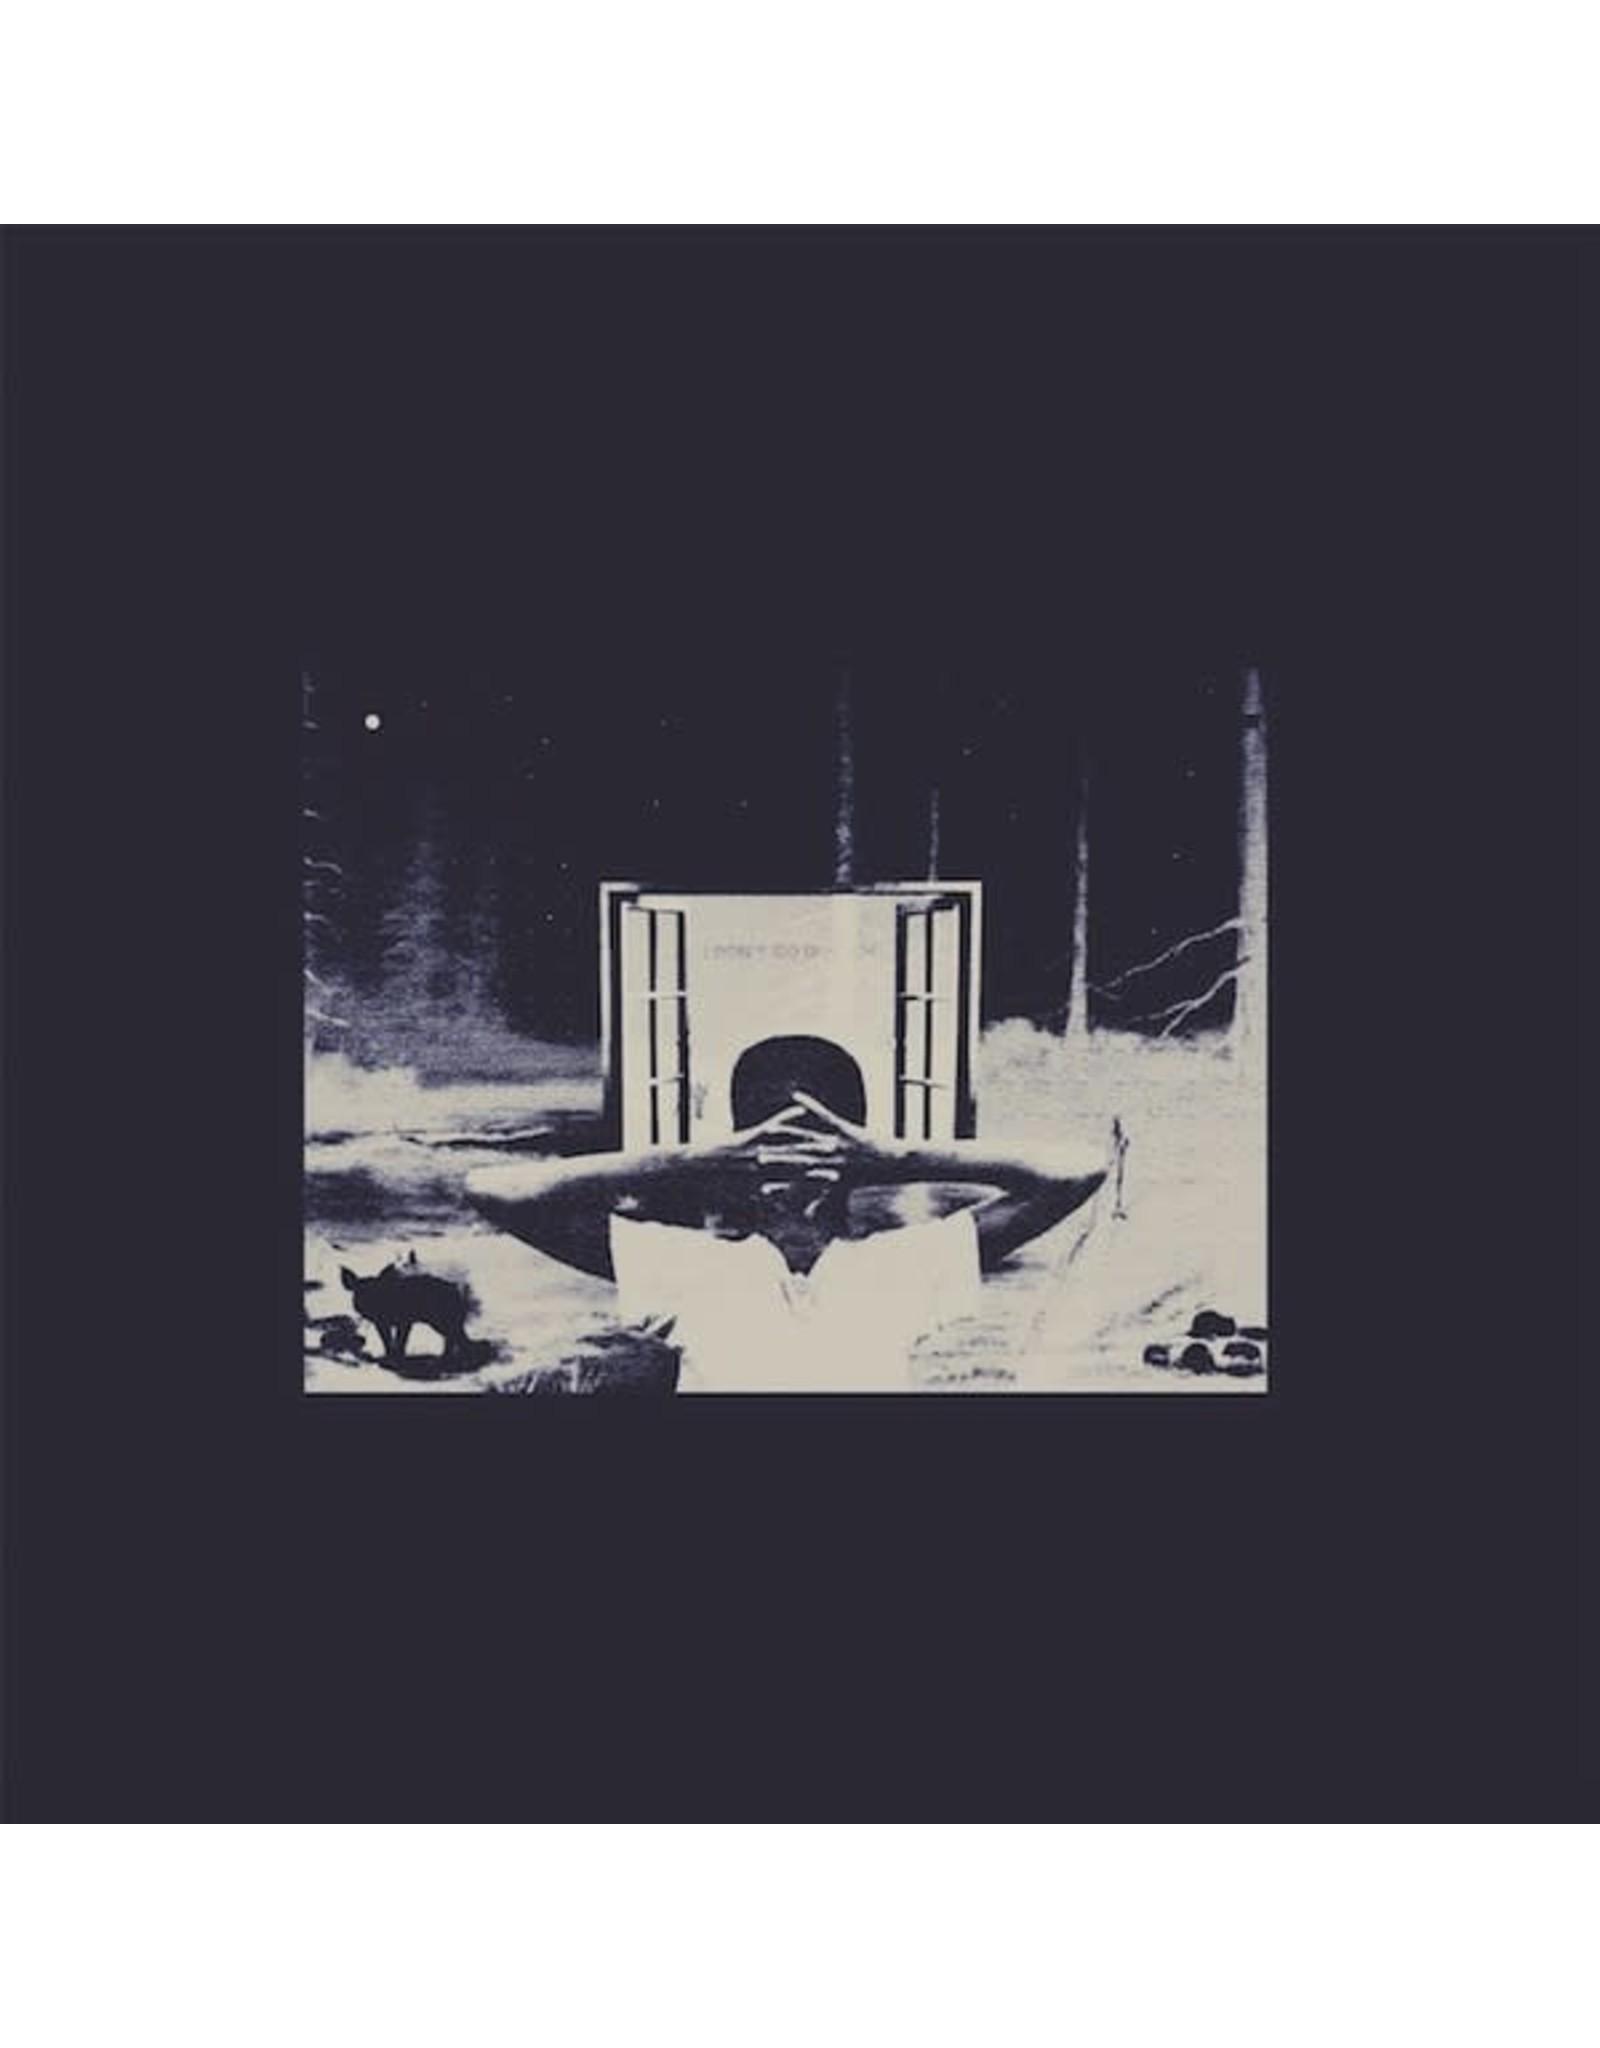 Earl Sweatshirt - I Don't Like Shit, I Don't Go Outside: An Album By Earl Sweatshirt LP